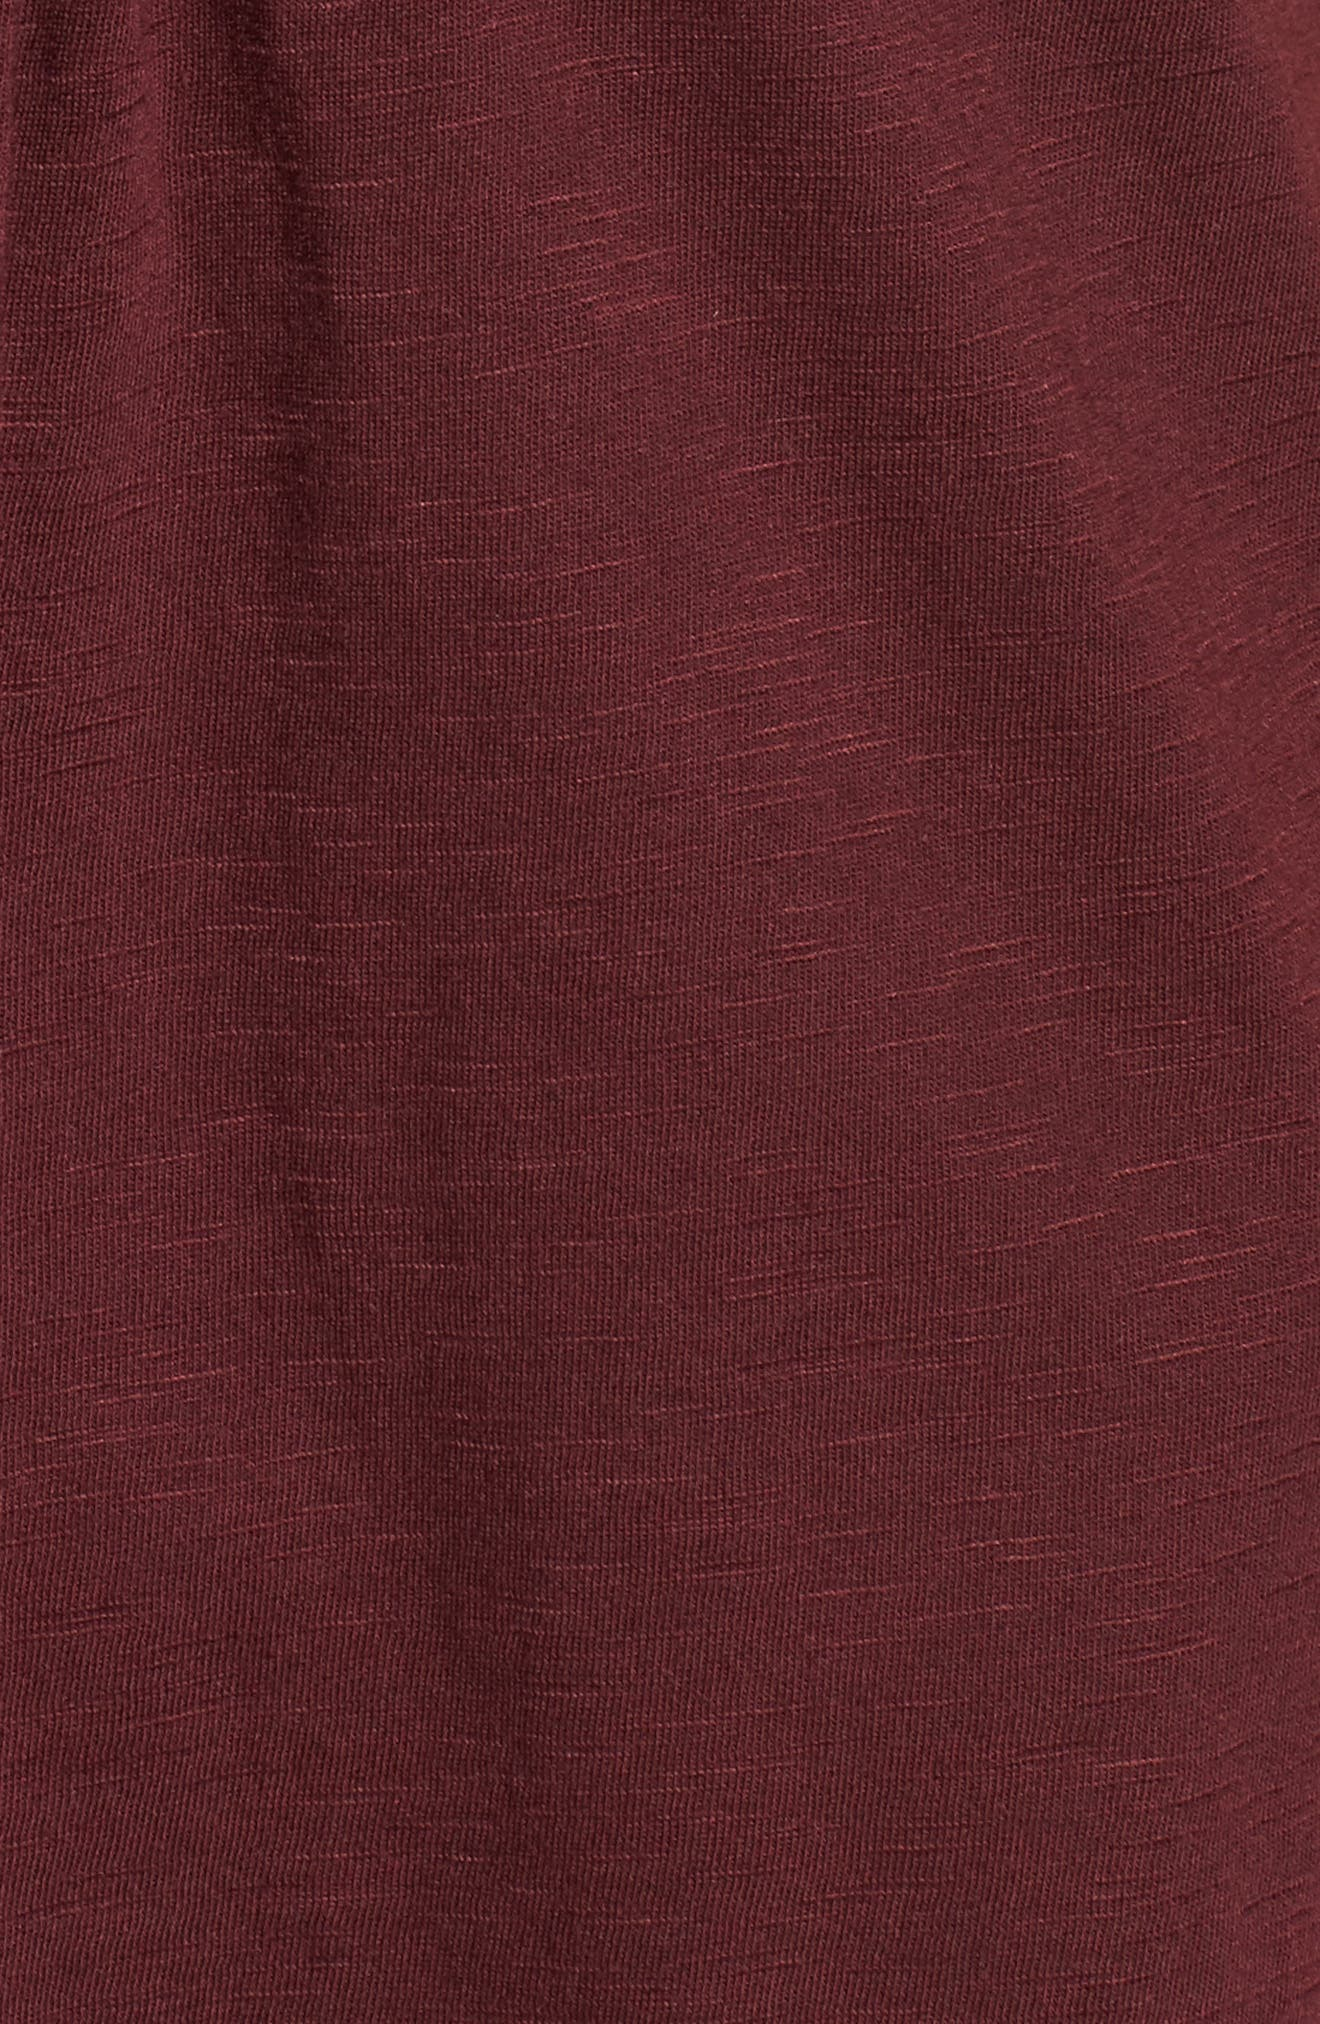 Tassel Trim Embroidered Tank,                             Alternate thumbnail 31, color,